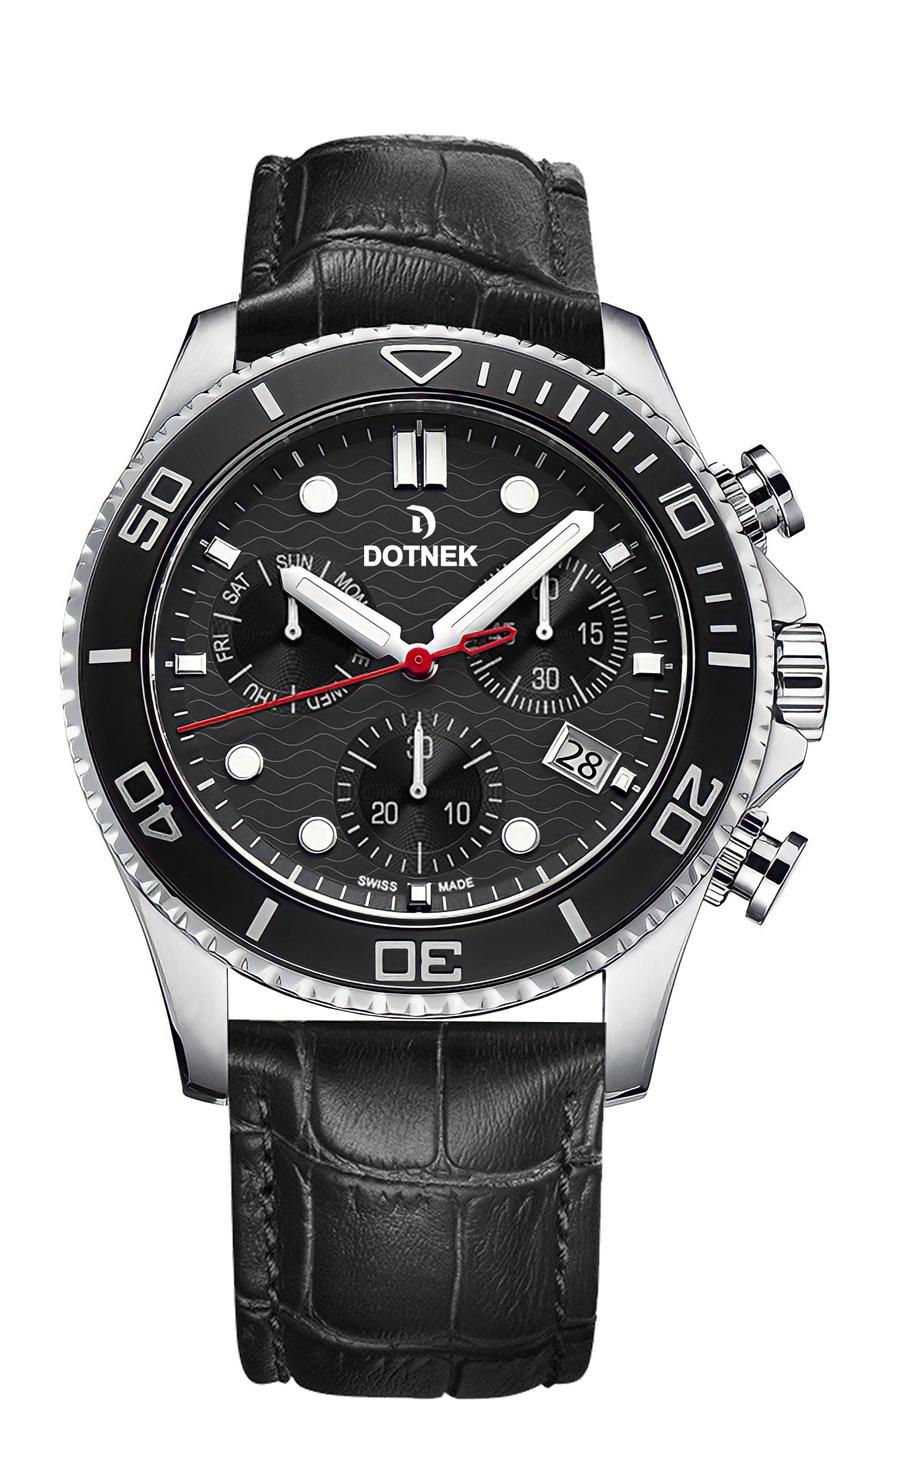 DOTNEK Drift-Master, Swiss chronograph men's watches, leather aligator strap